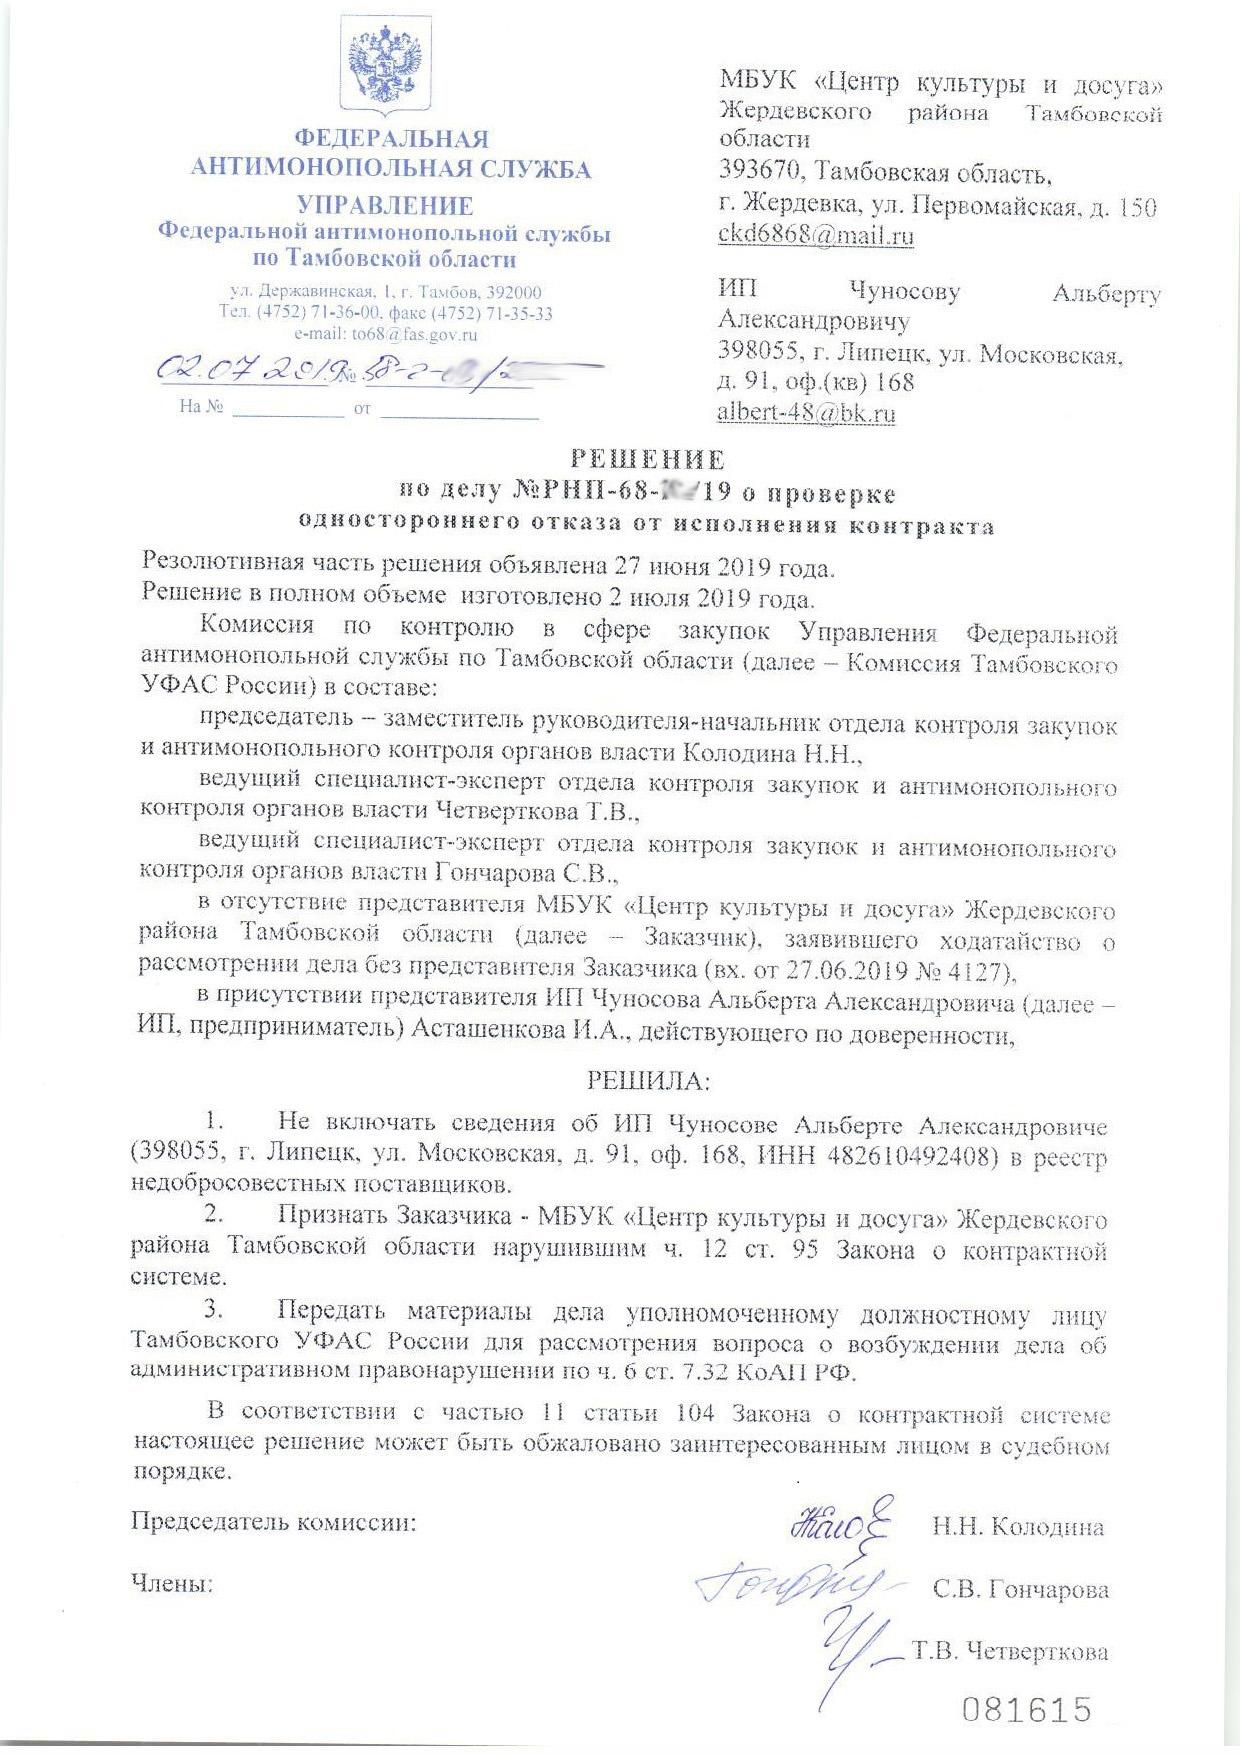 1ИП Чуносов